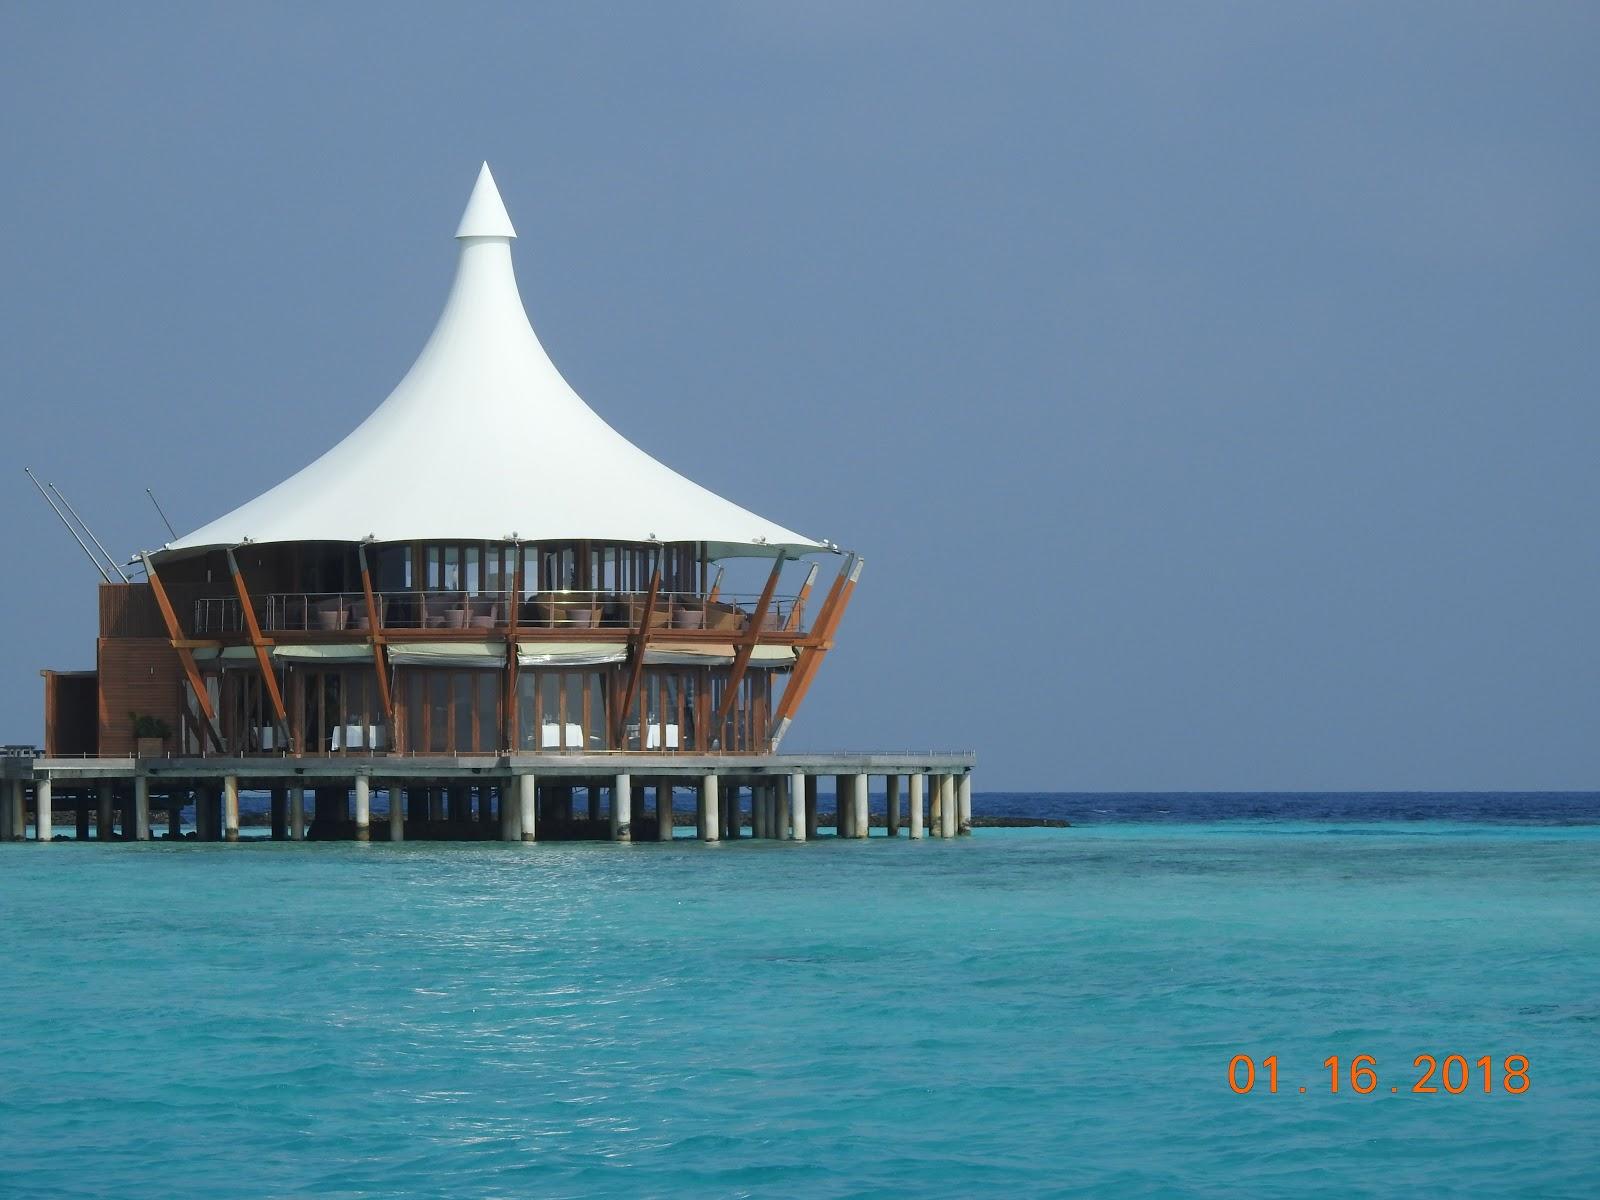 invite-to-paradise-sri-lanka-maldives-holiday-specialists-nutan-vidyut-patel-baros-1.jpg